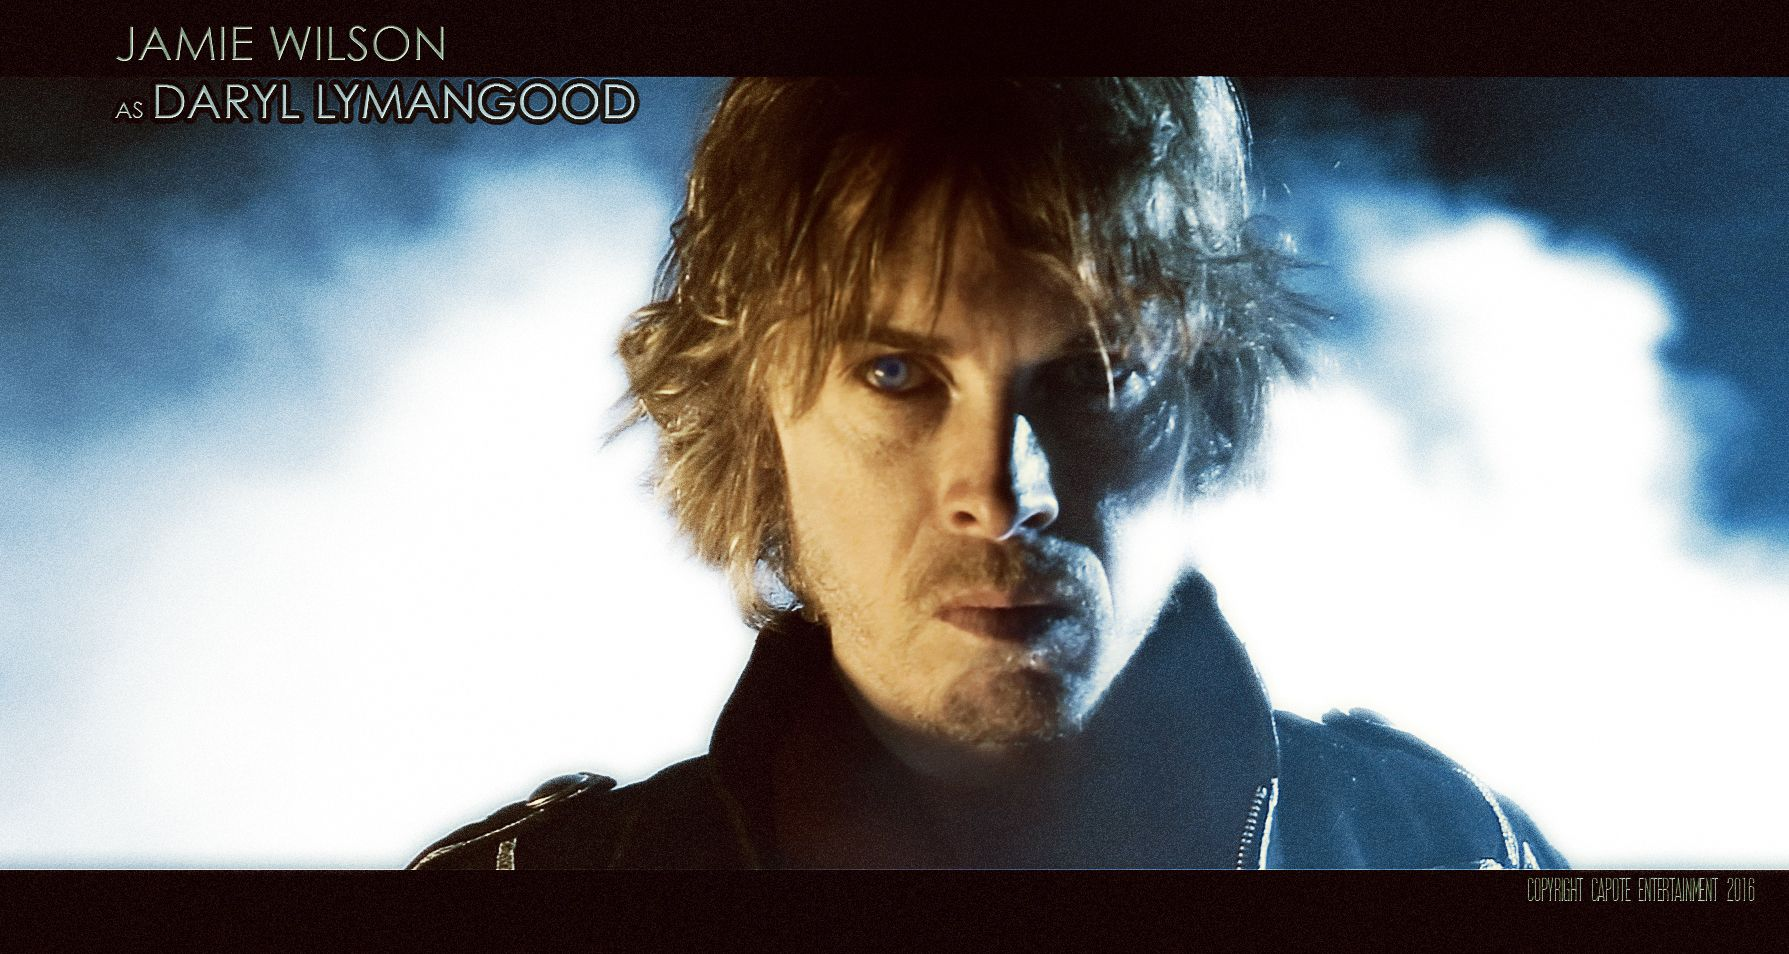 Jamie Wilson (Hellboy 2, Blade 2, Pan) as Daryl Lymangood in Renko, the horror feature film by director David De Bartolome.